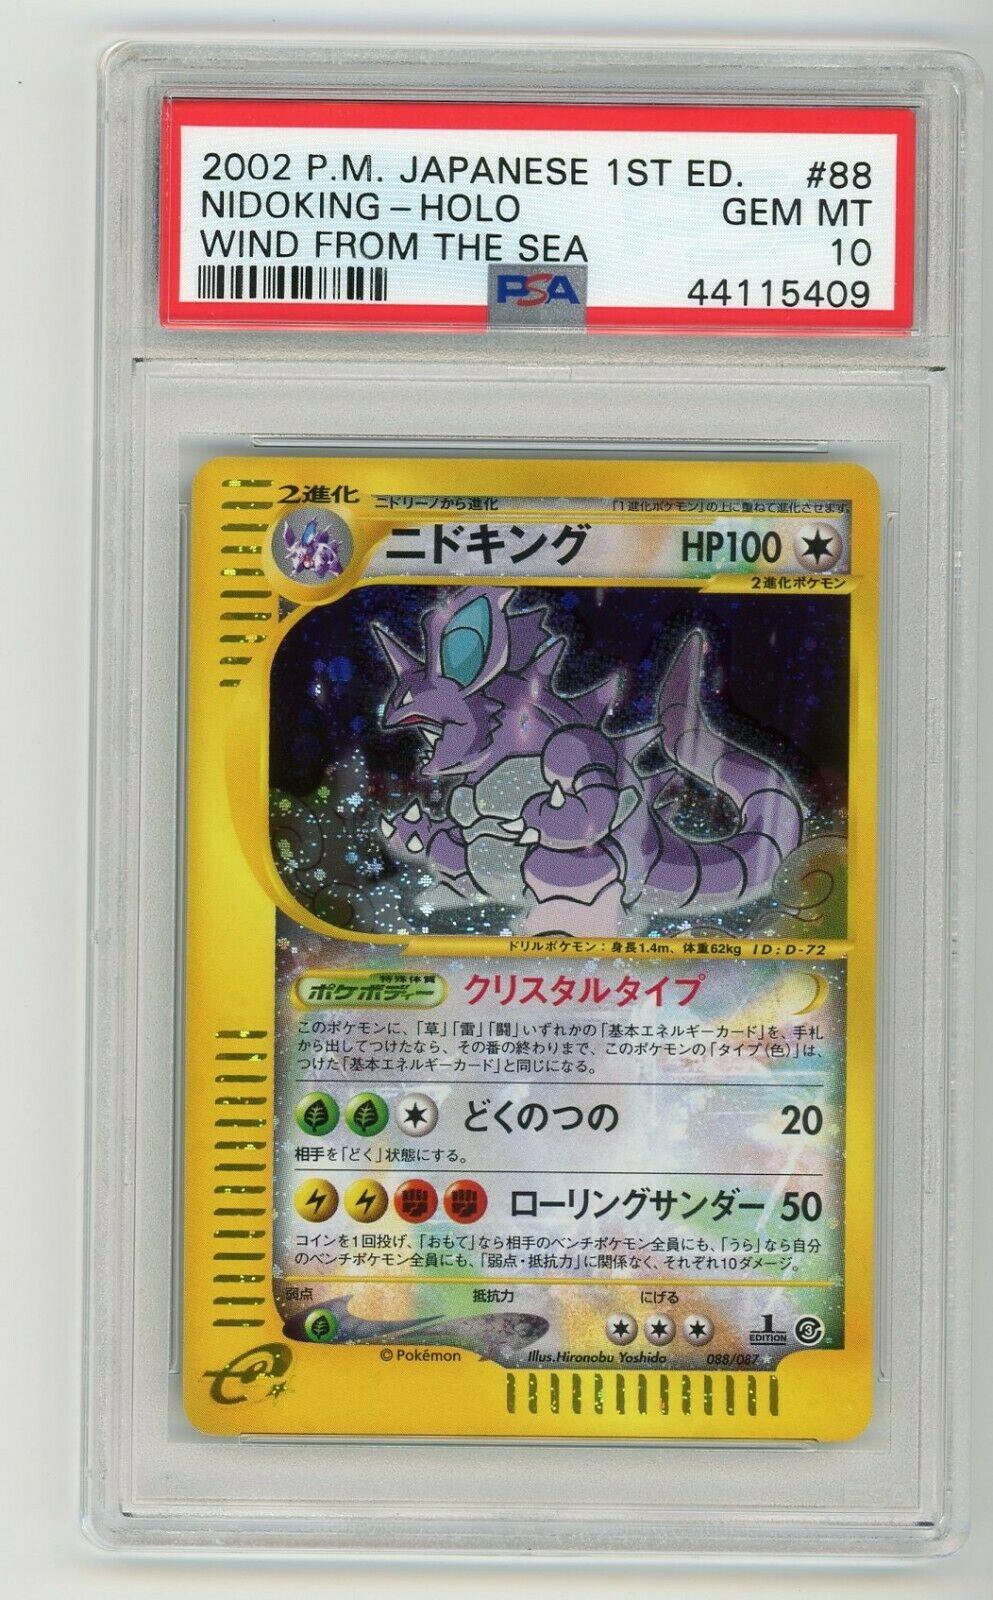 PSA 10 POKEMON JAPANESE CRYSTAL NIDOKING 088 CARD 2002 1ST ED ESERIES AQUAPOLIS